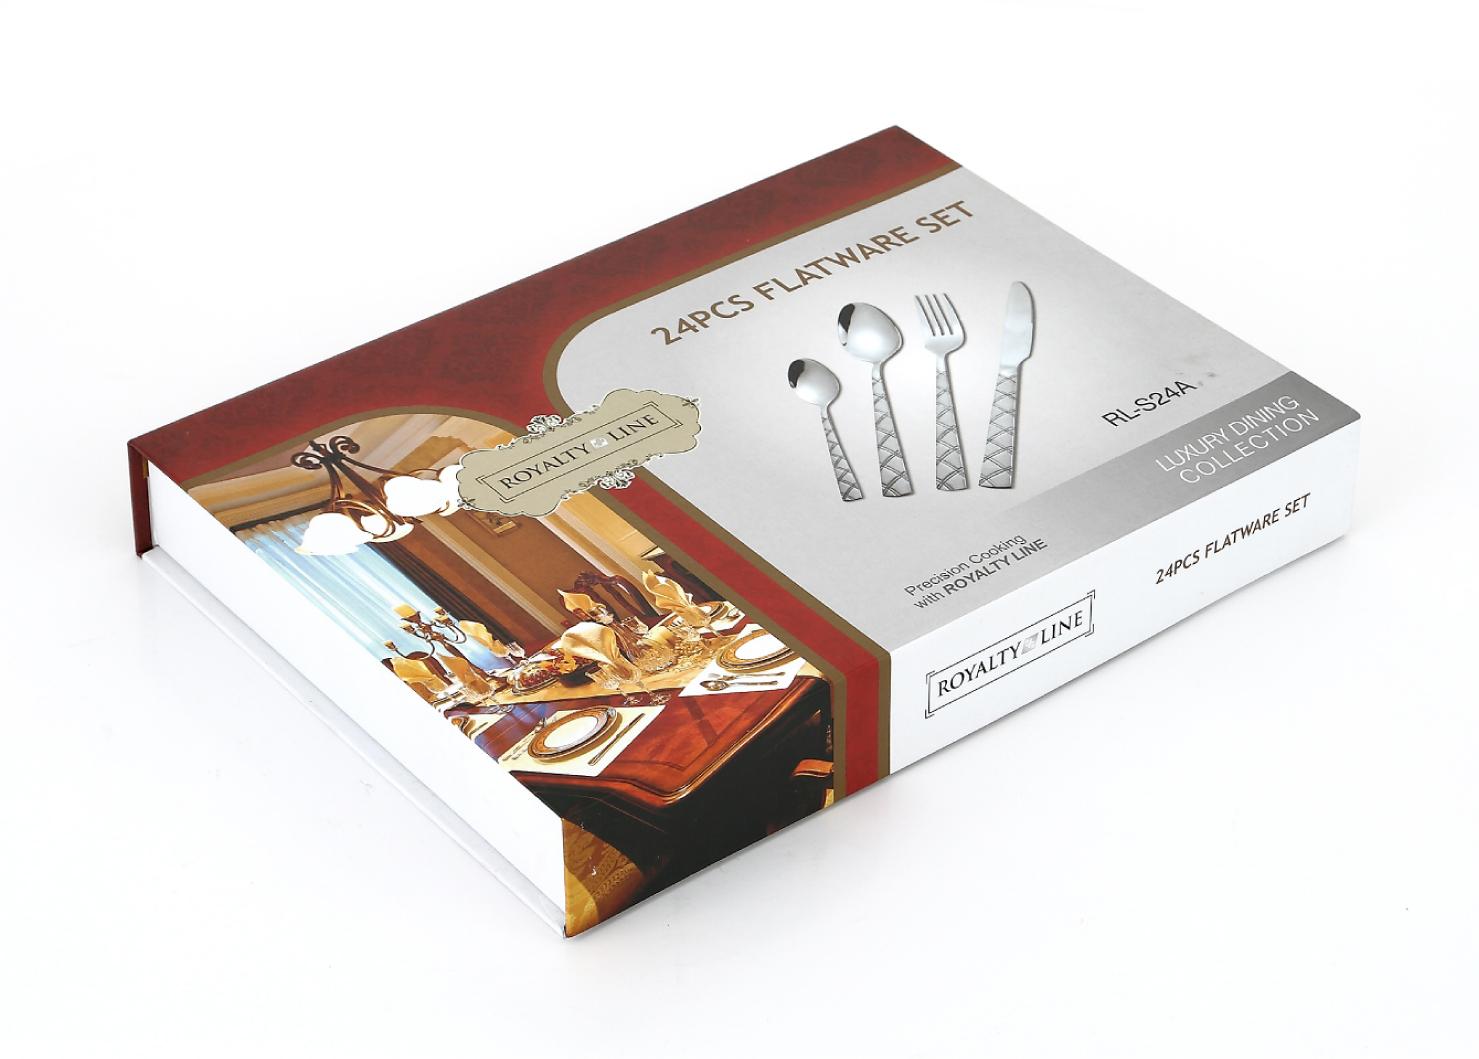 1090 - royalty line - euroricami viterbo - set posate coltelli e ... - Utensili Cucina On Line